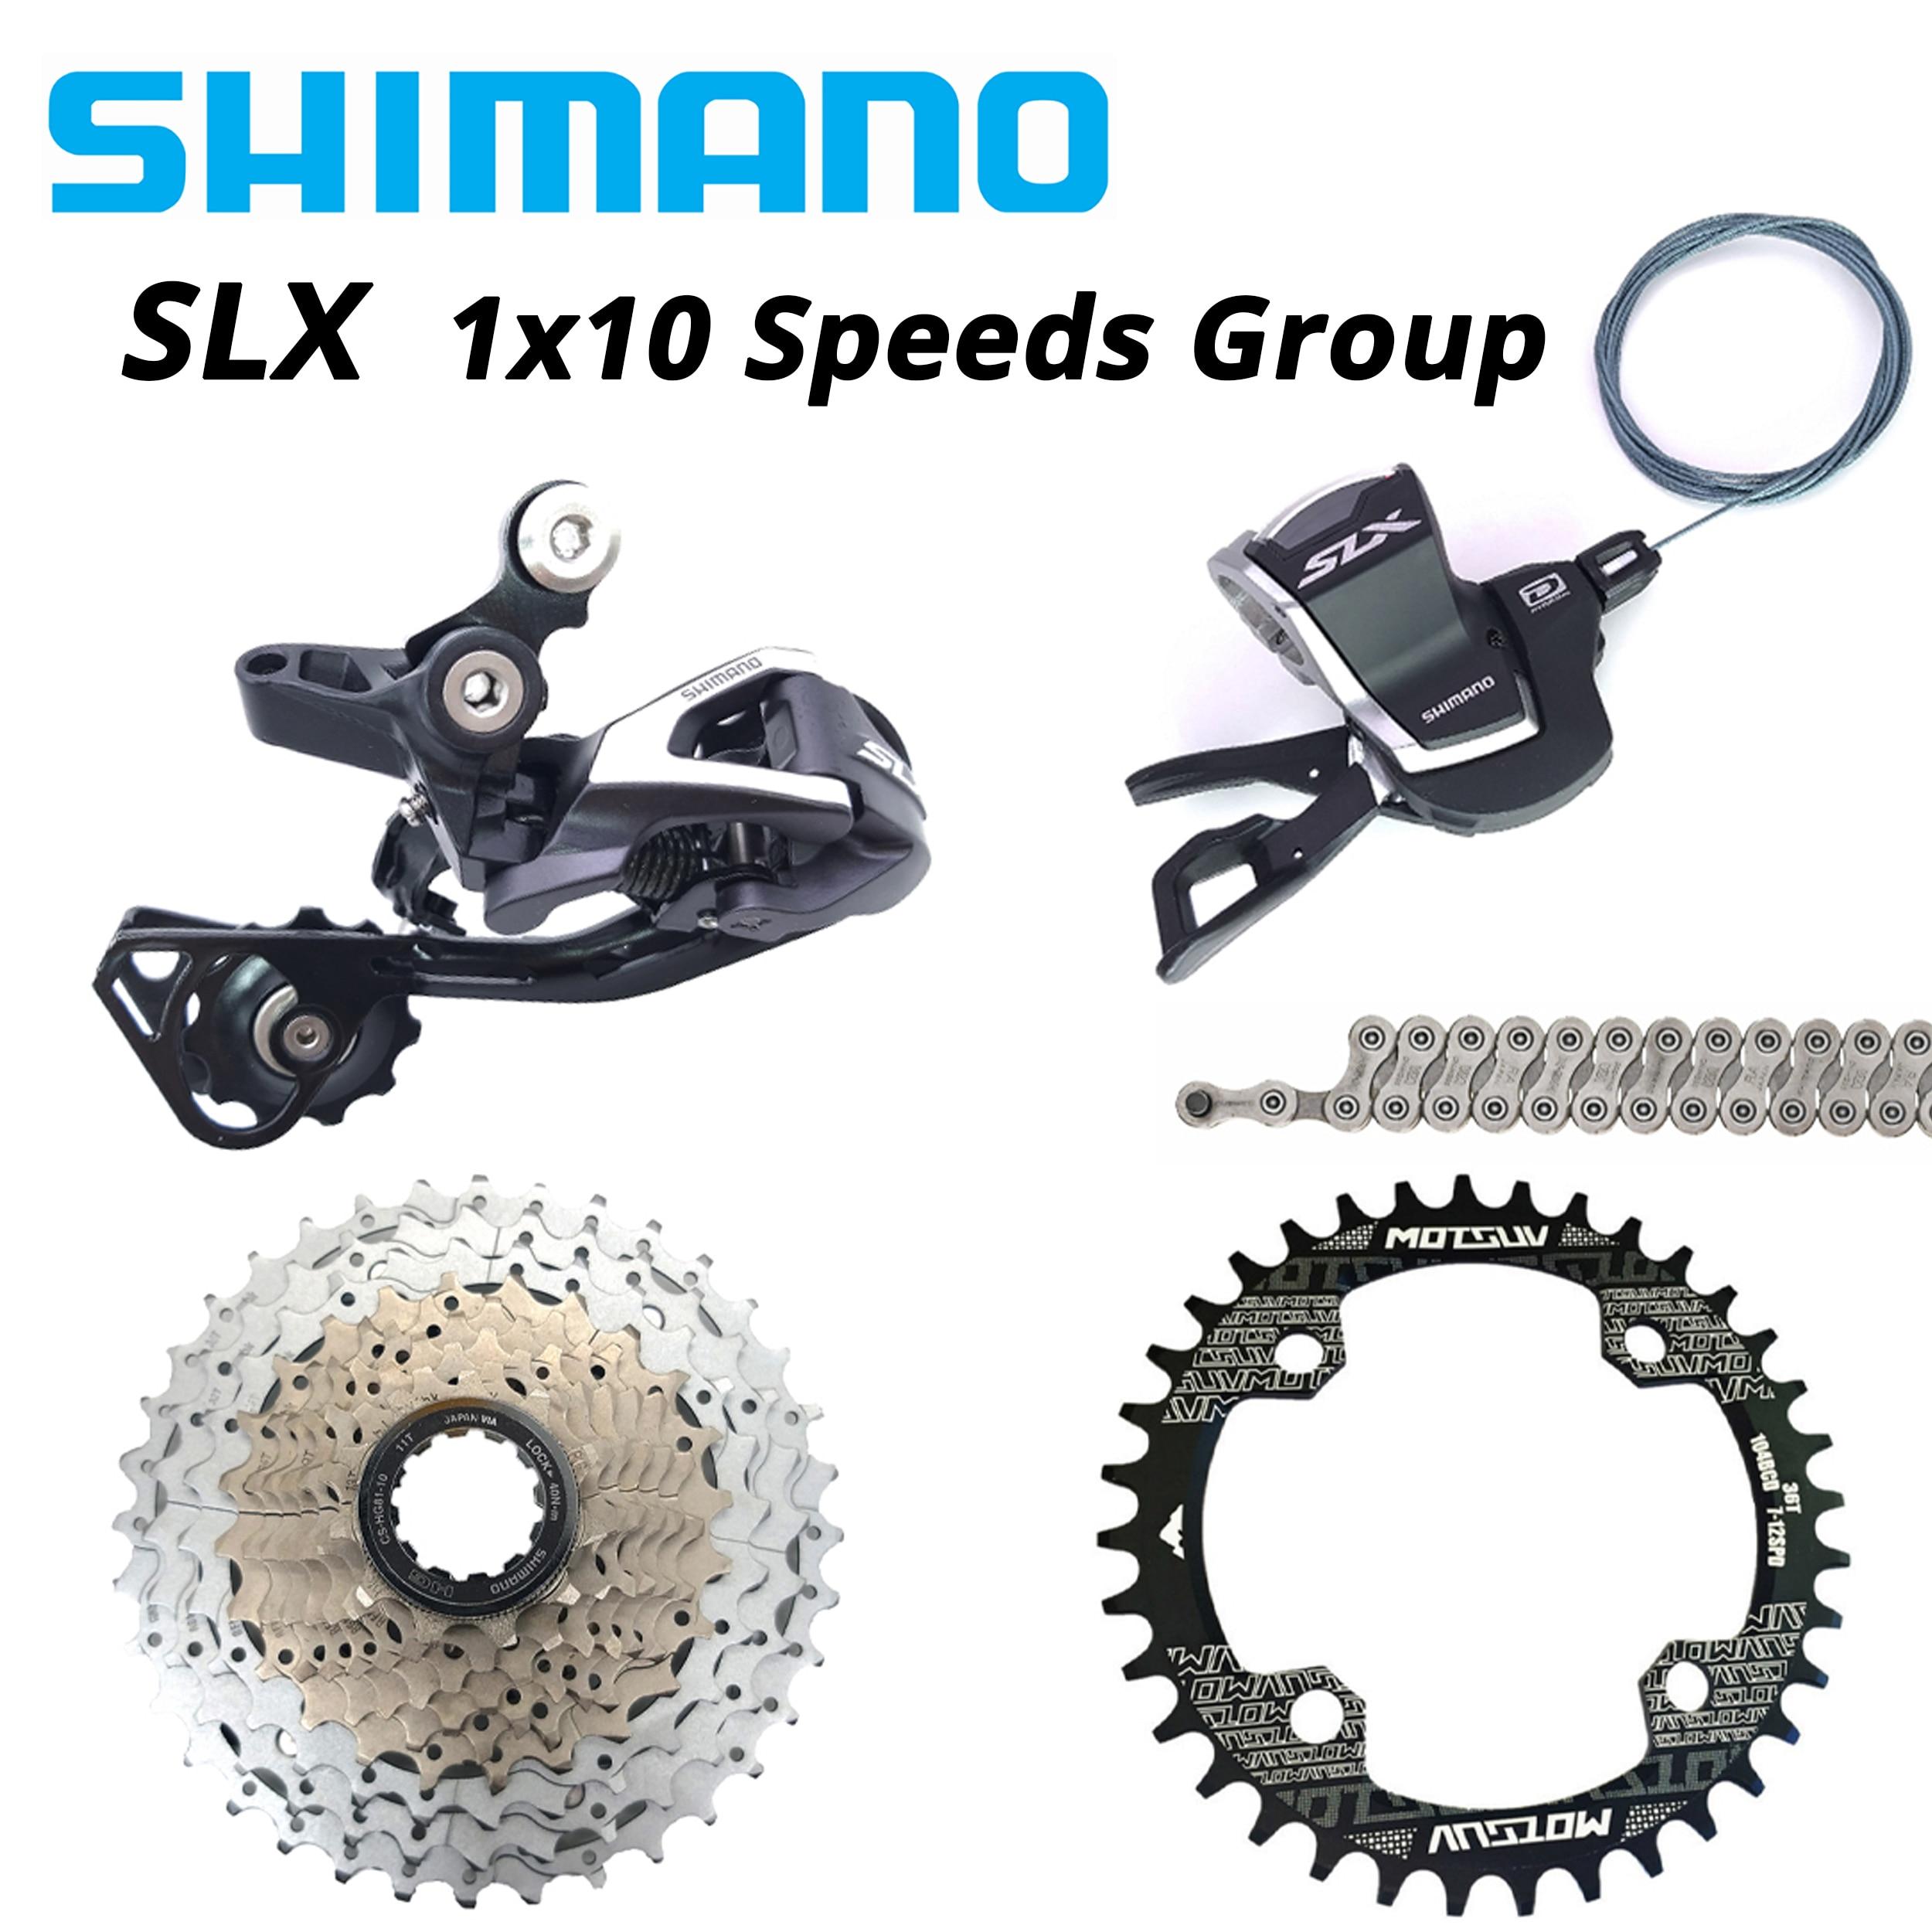 Shimano slx 1x10s 10 s 10 velocidade groupset rd-m670 sl m7000 HG81-10 11-36t CN-HG95 kmc x10 sol 11-42t 46t 50t corrente